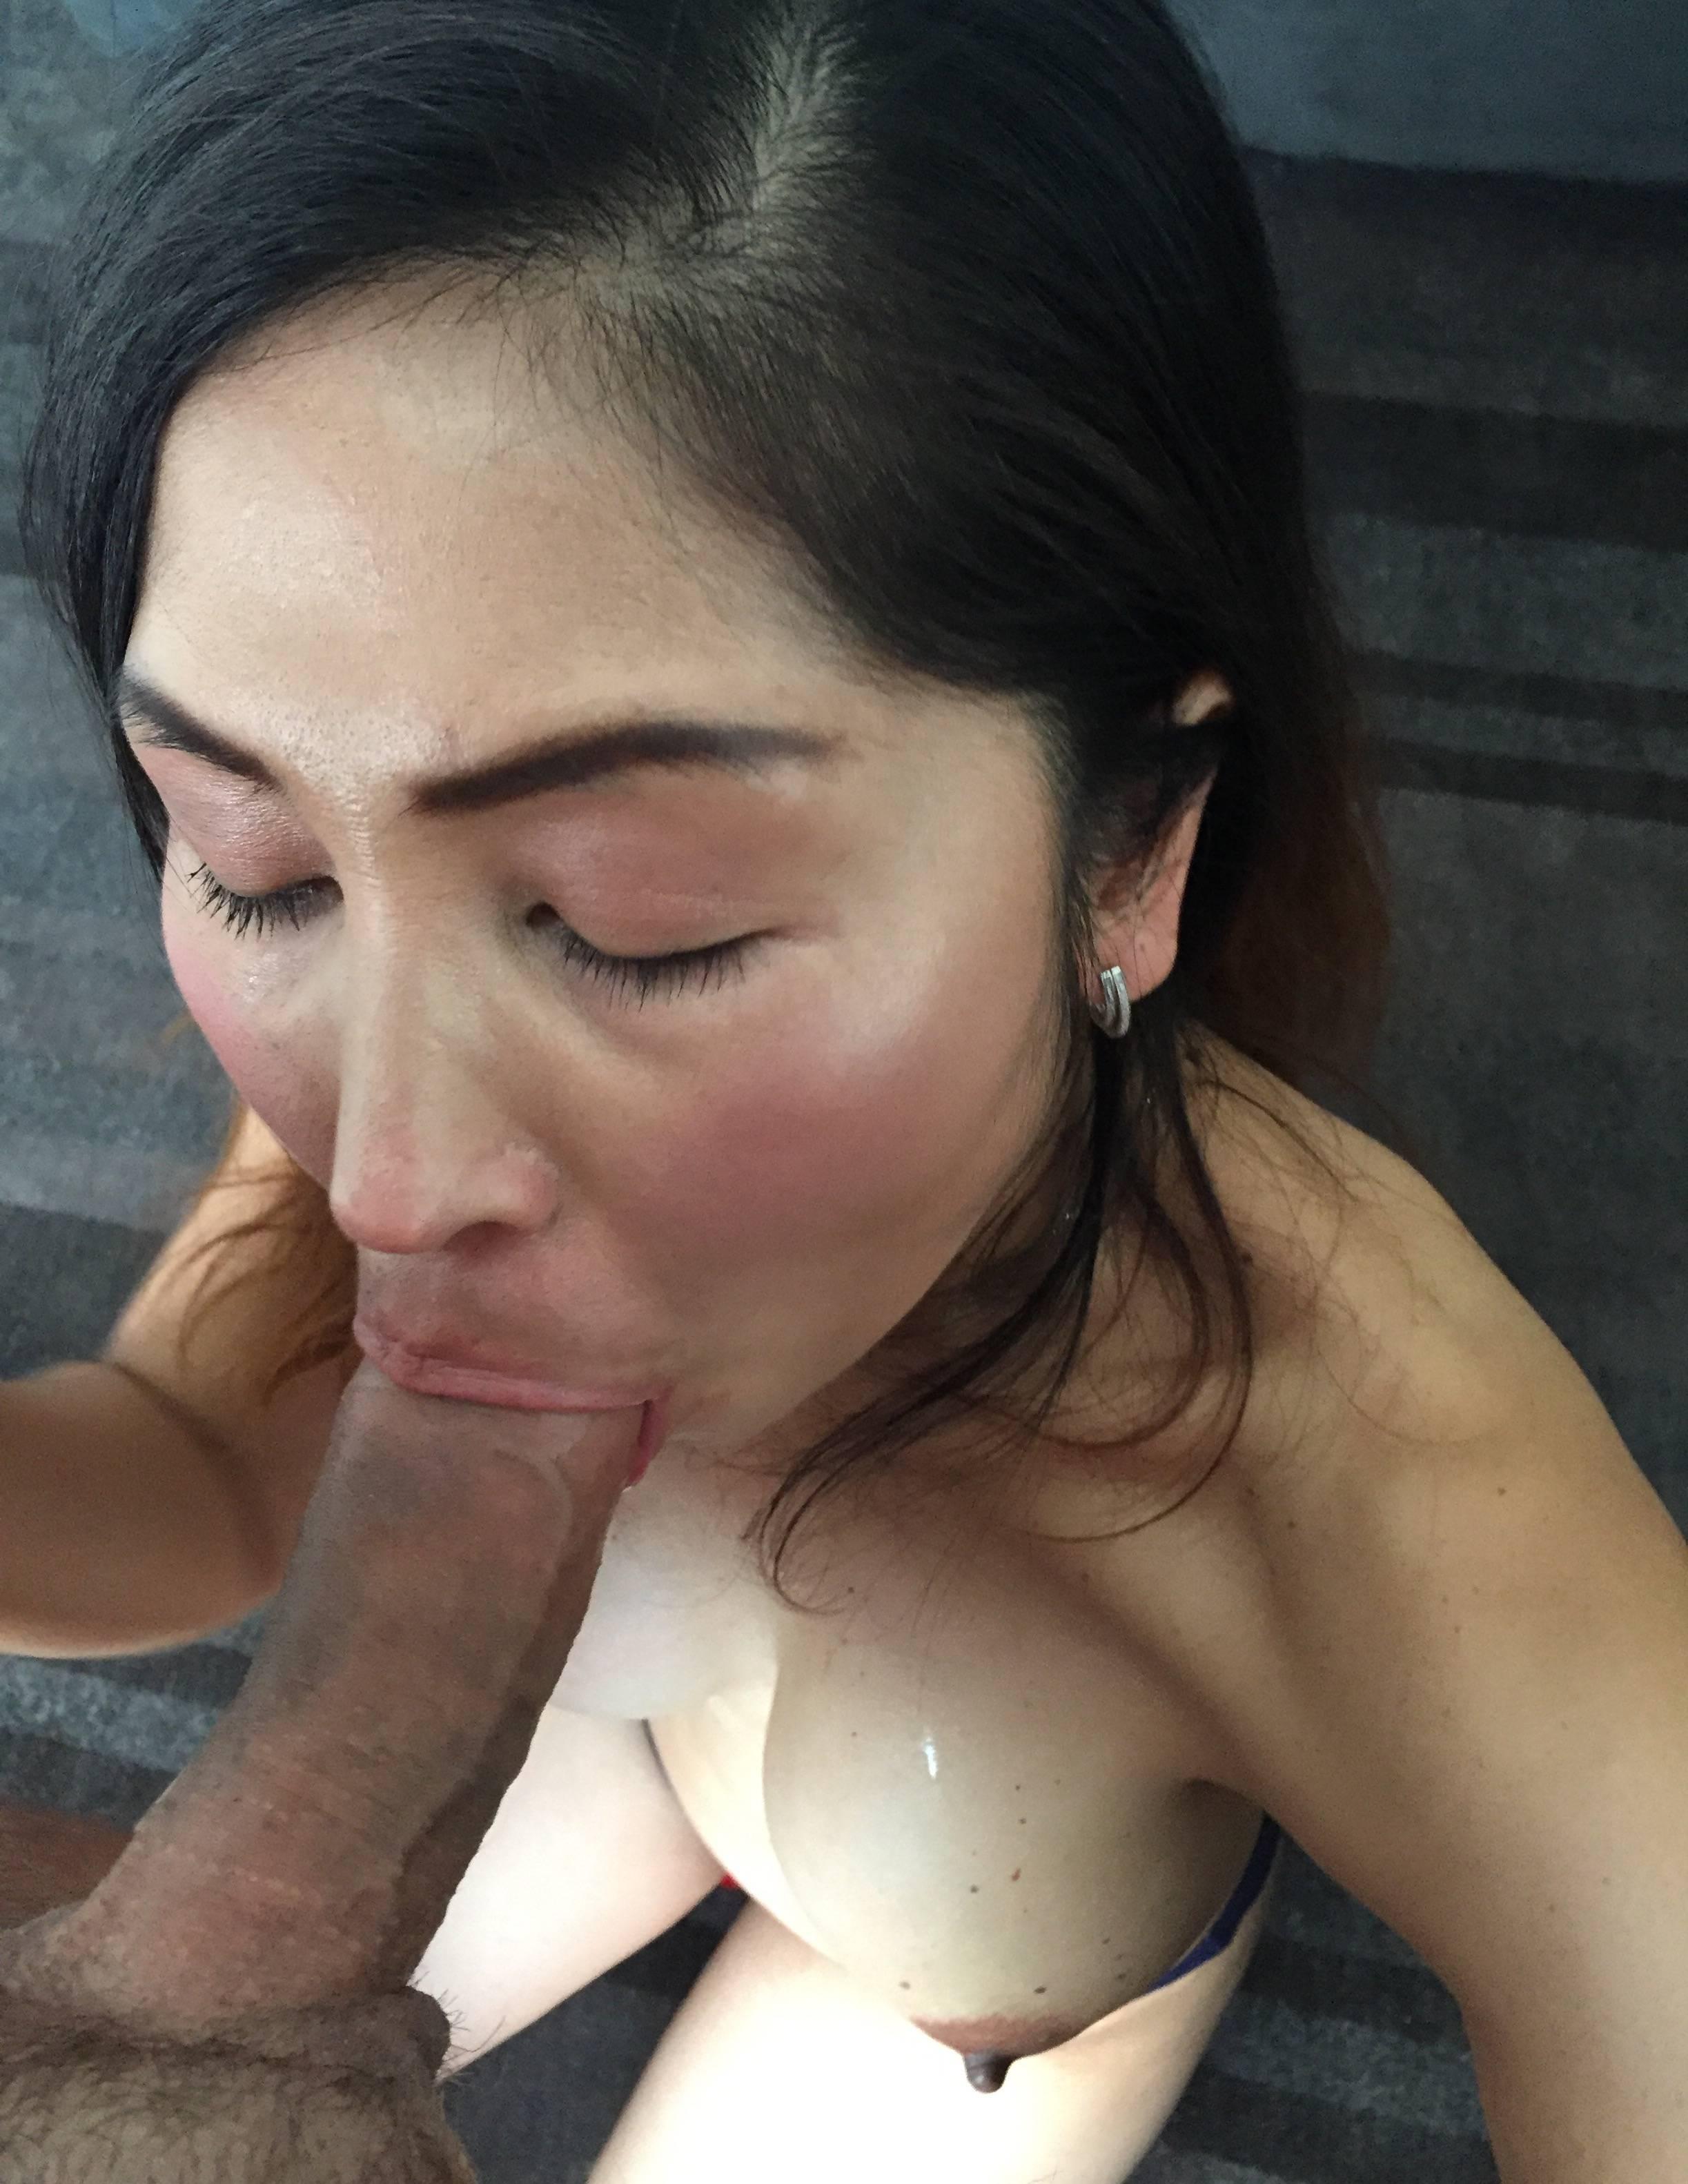 Nude asian milf Free Asian